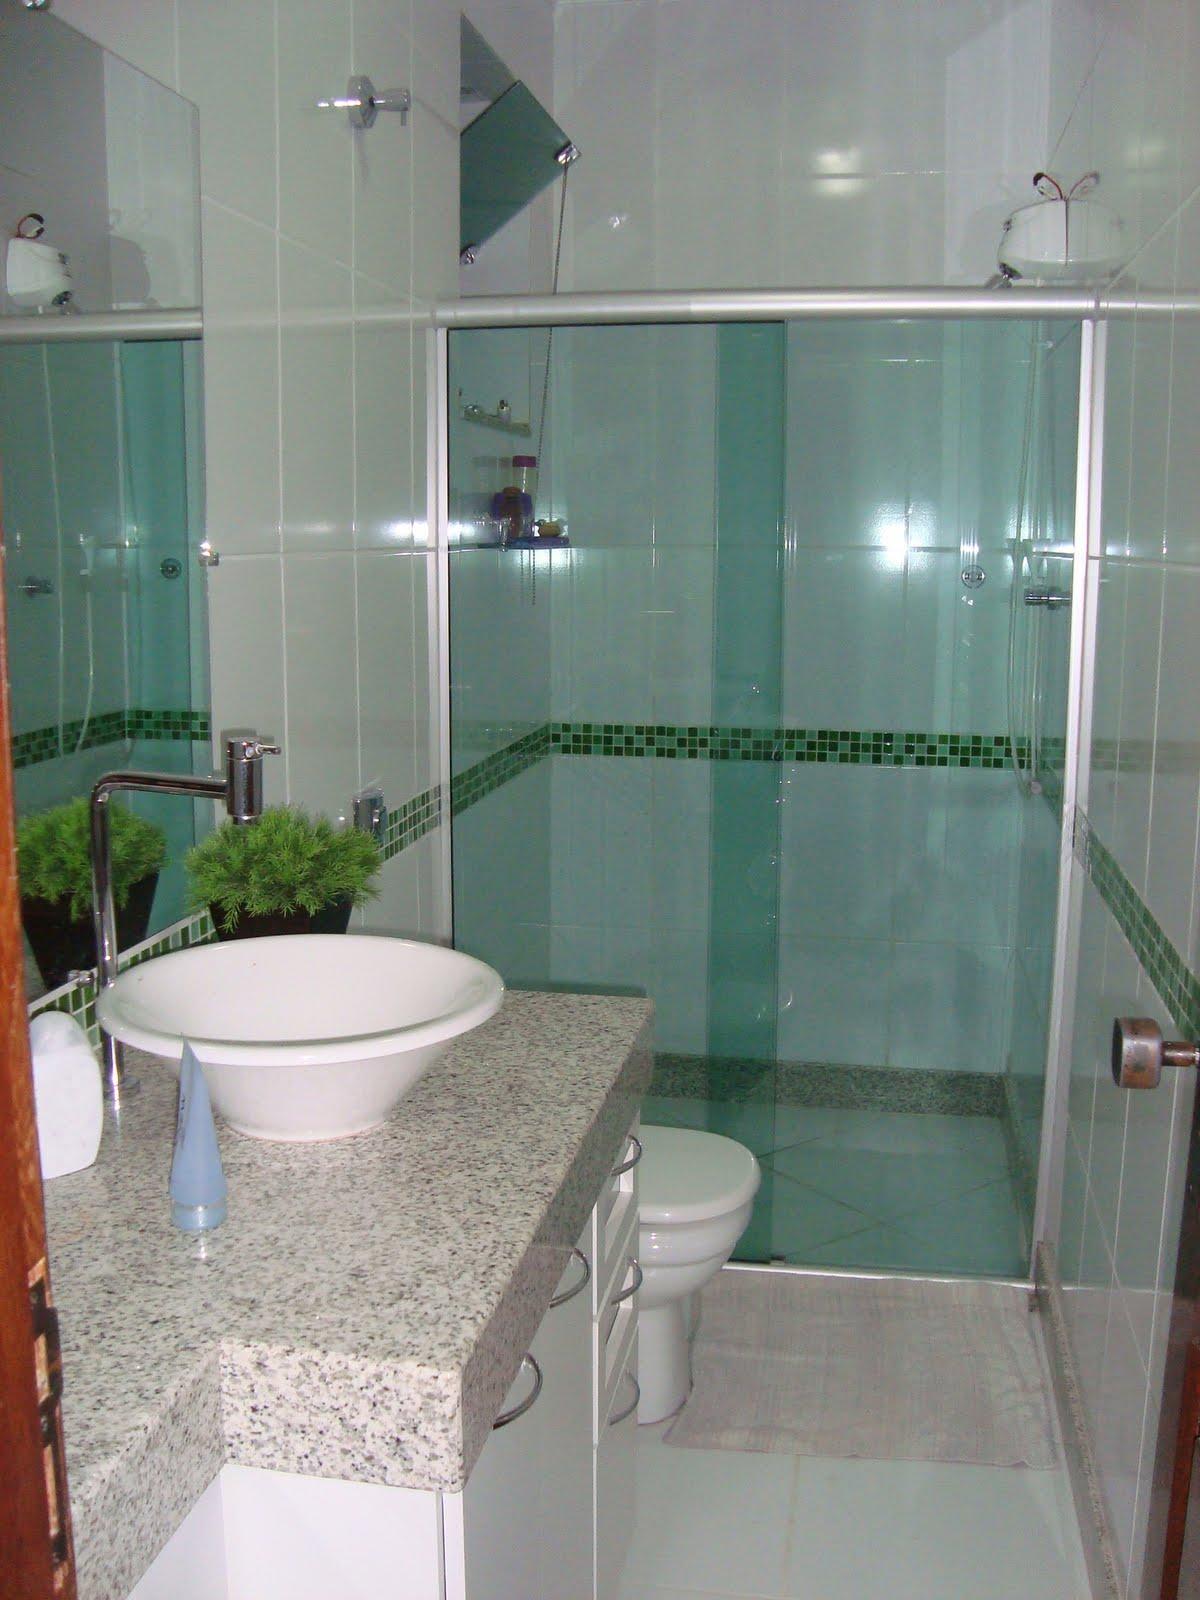 Urbanismo Ltda.: Banheiro Residencial Santa Helena Cel. Fabriciano #773B29 1200 1600